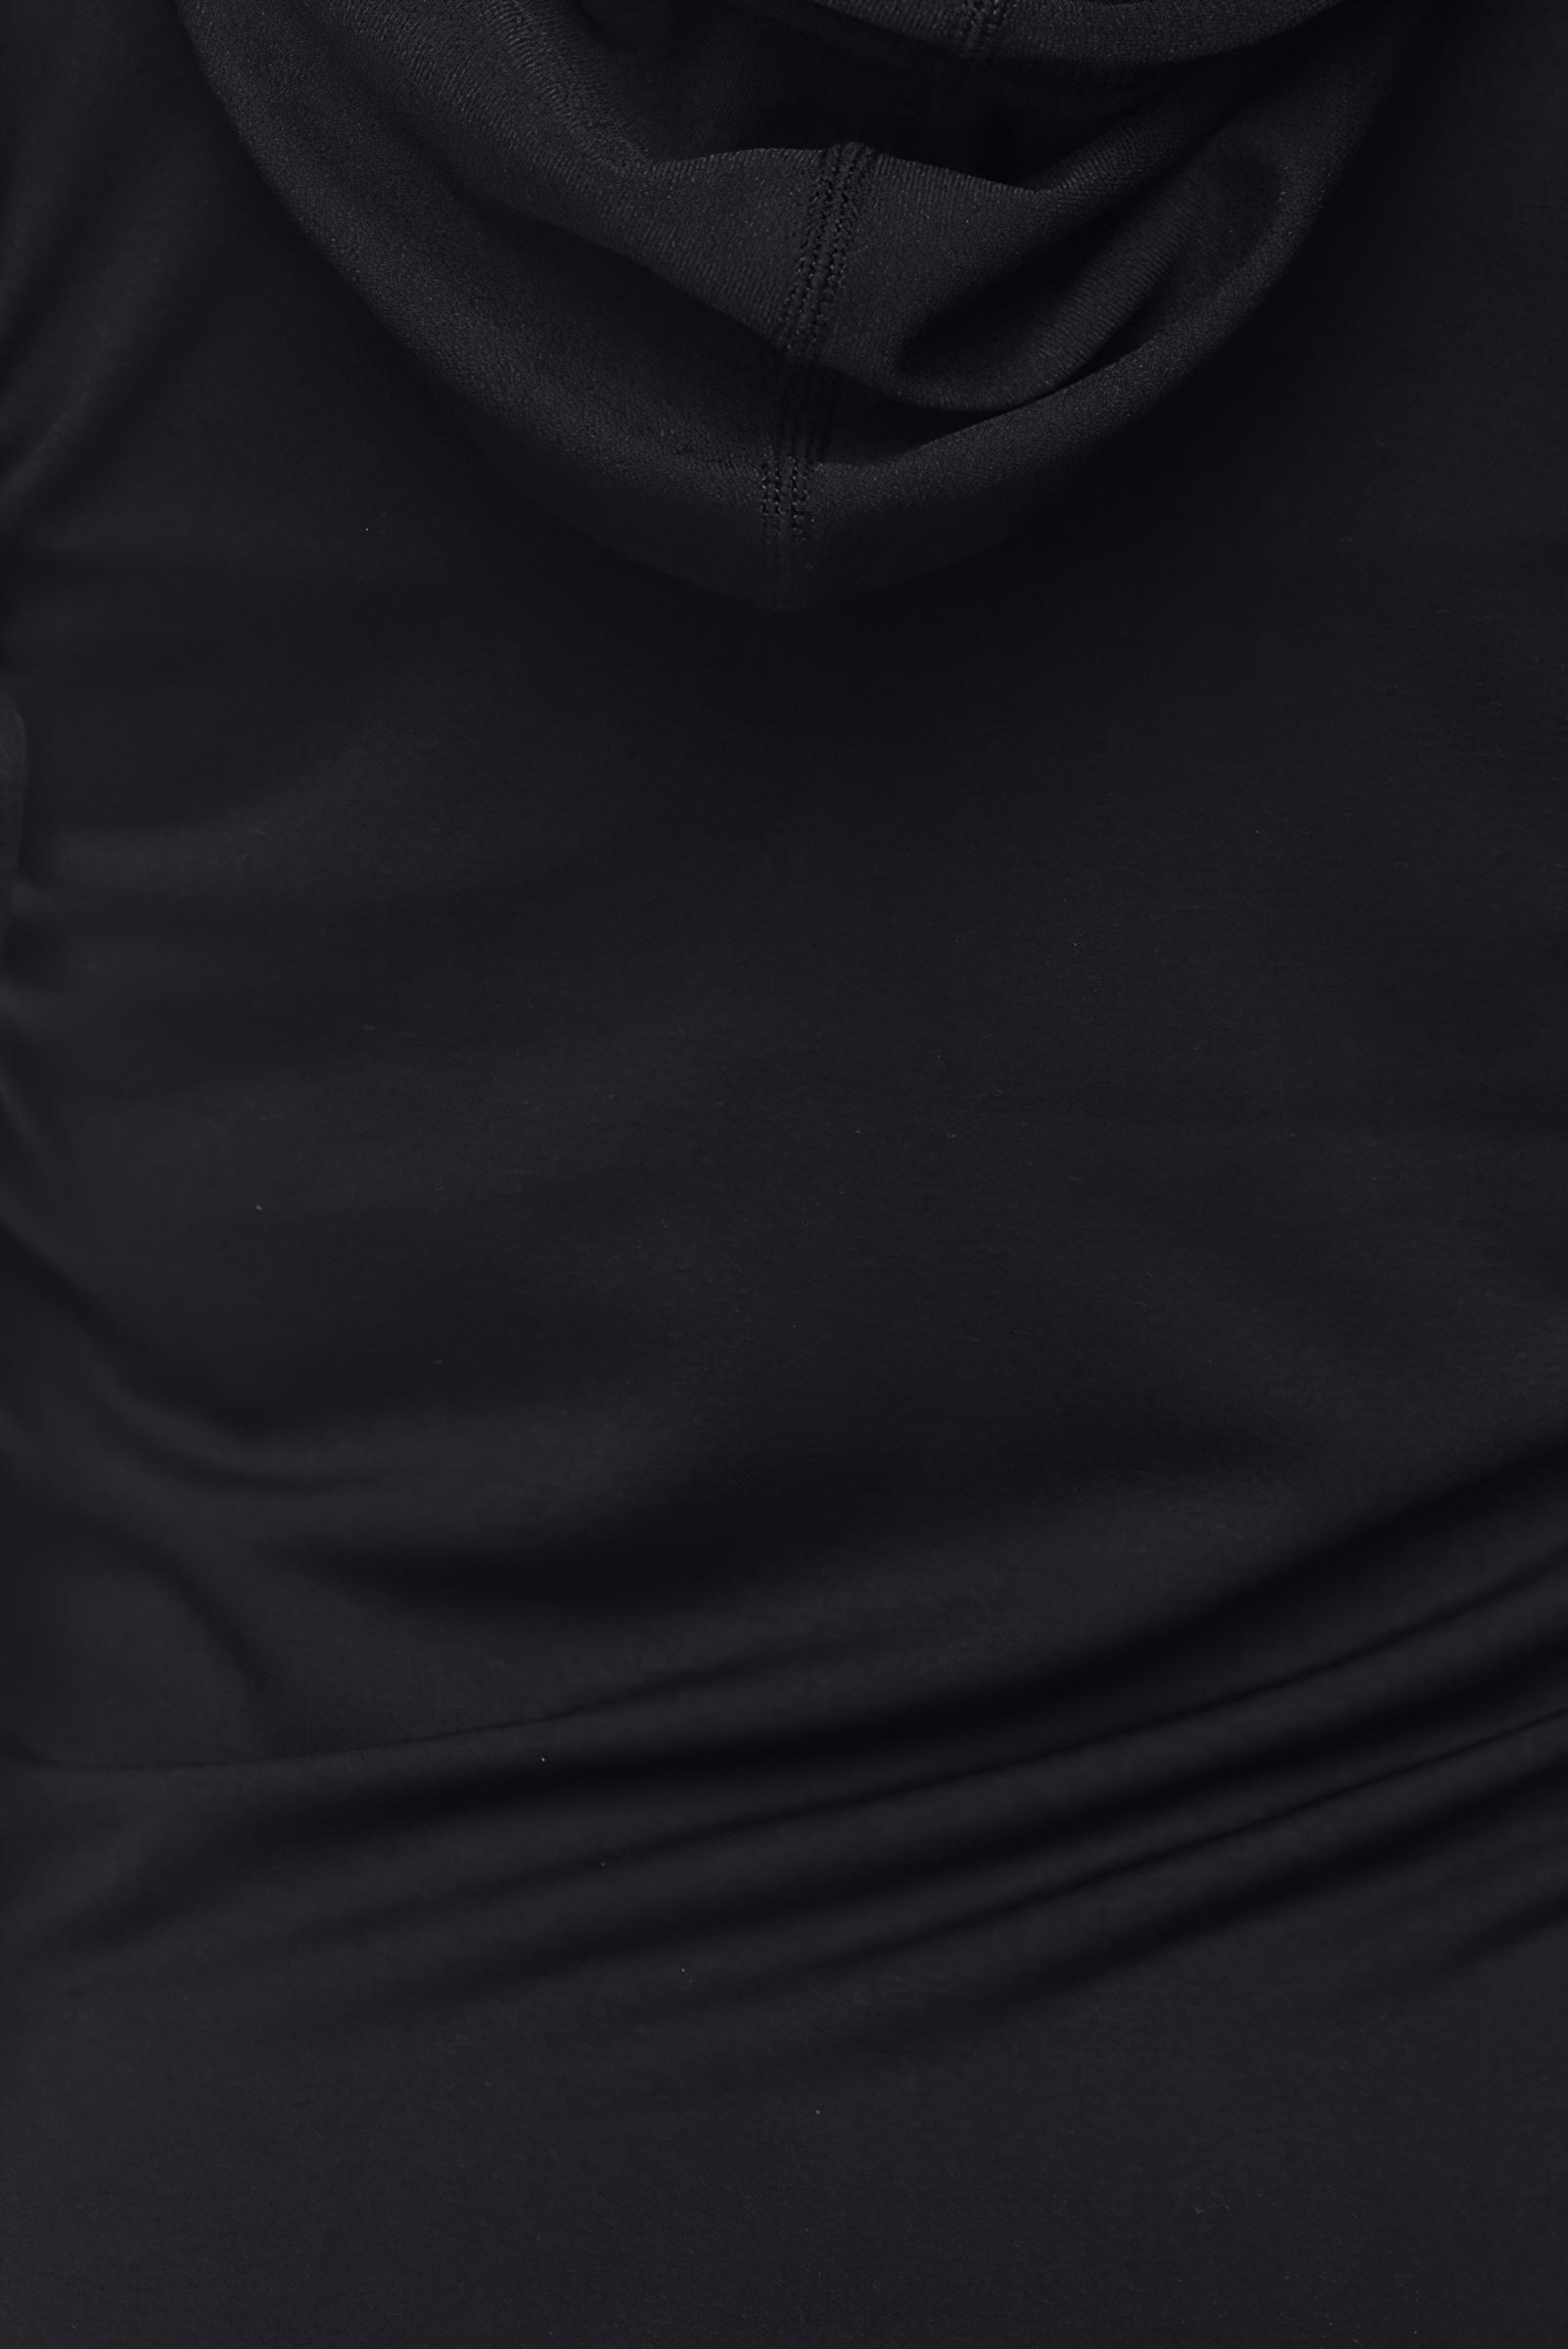 Women-039-s-Juniors-Active-Set-Wear-Zip-Up-Hoodie-and-Legging thumbnail 14